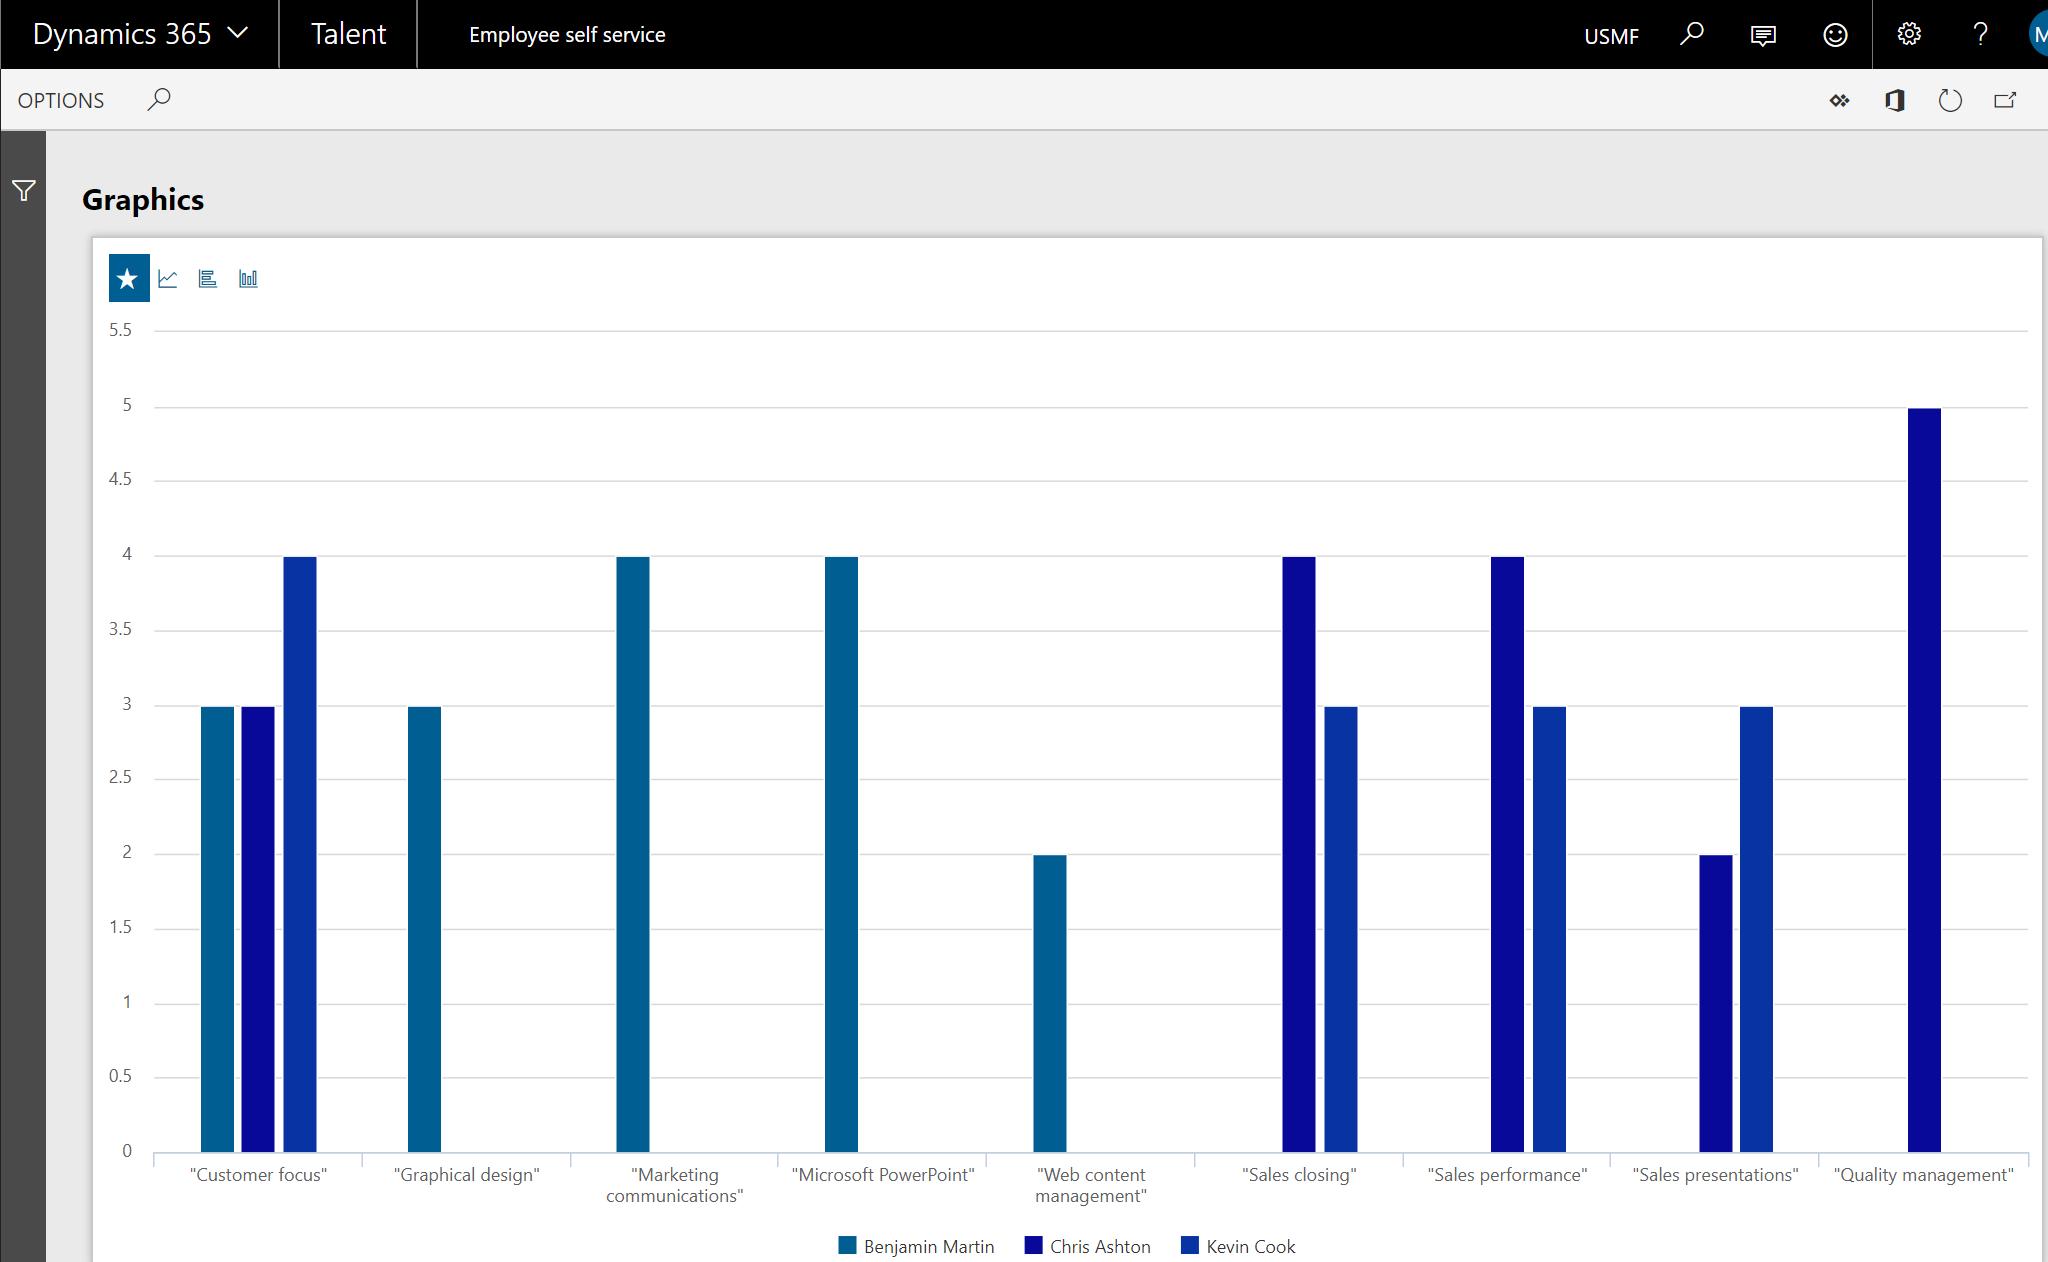 Manager Self-service - Team skills assessment graphics